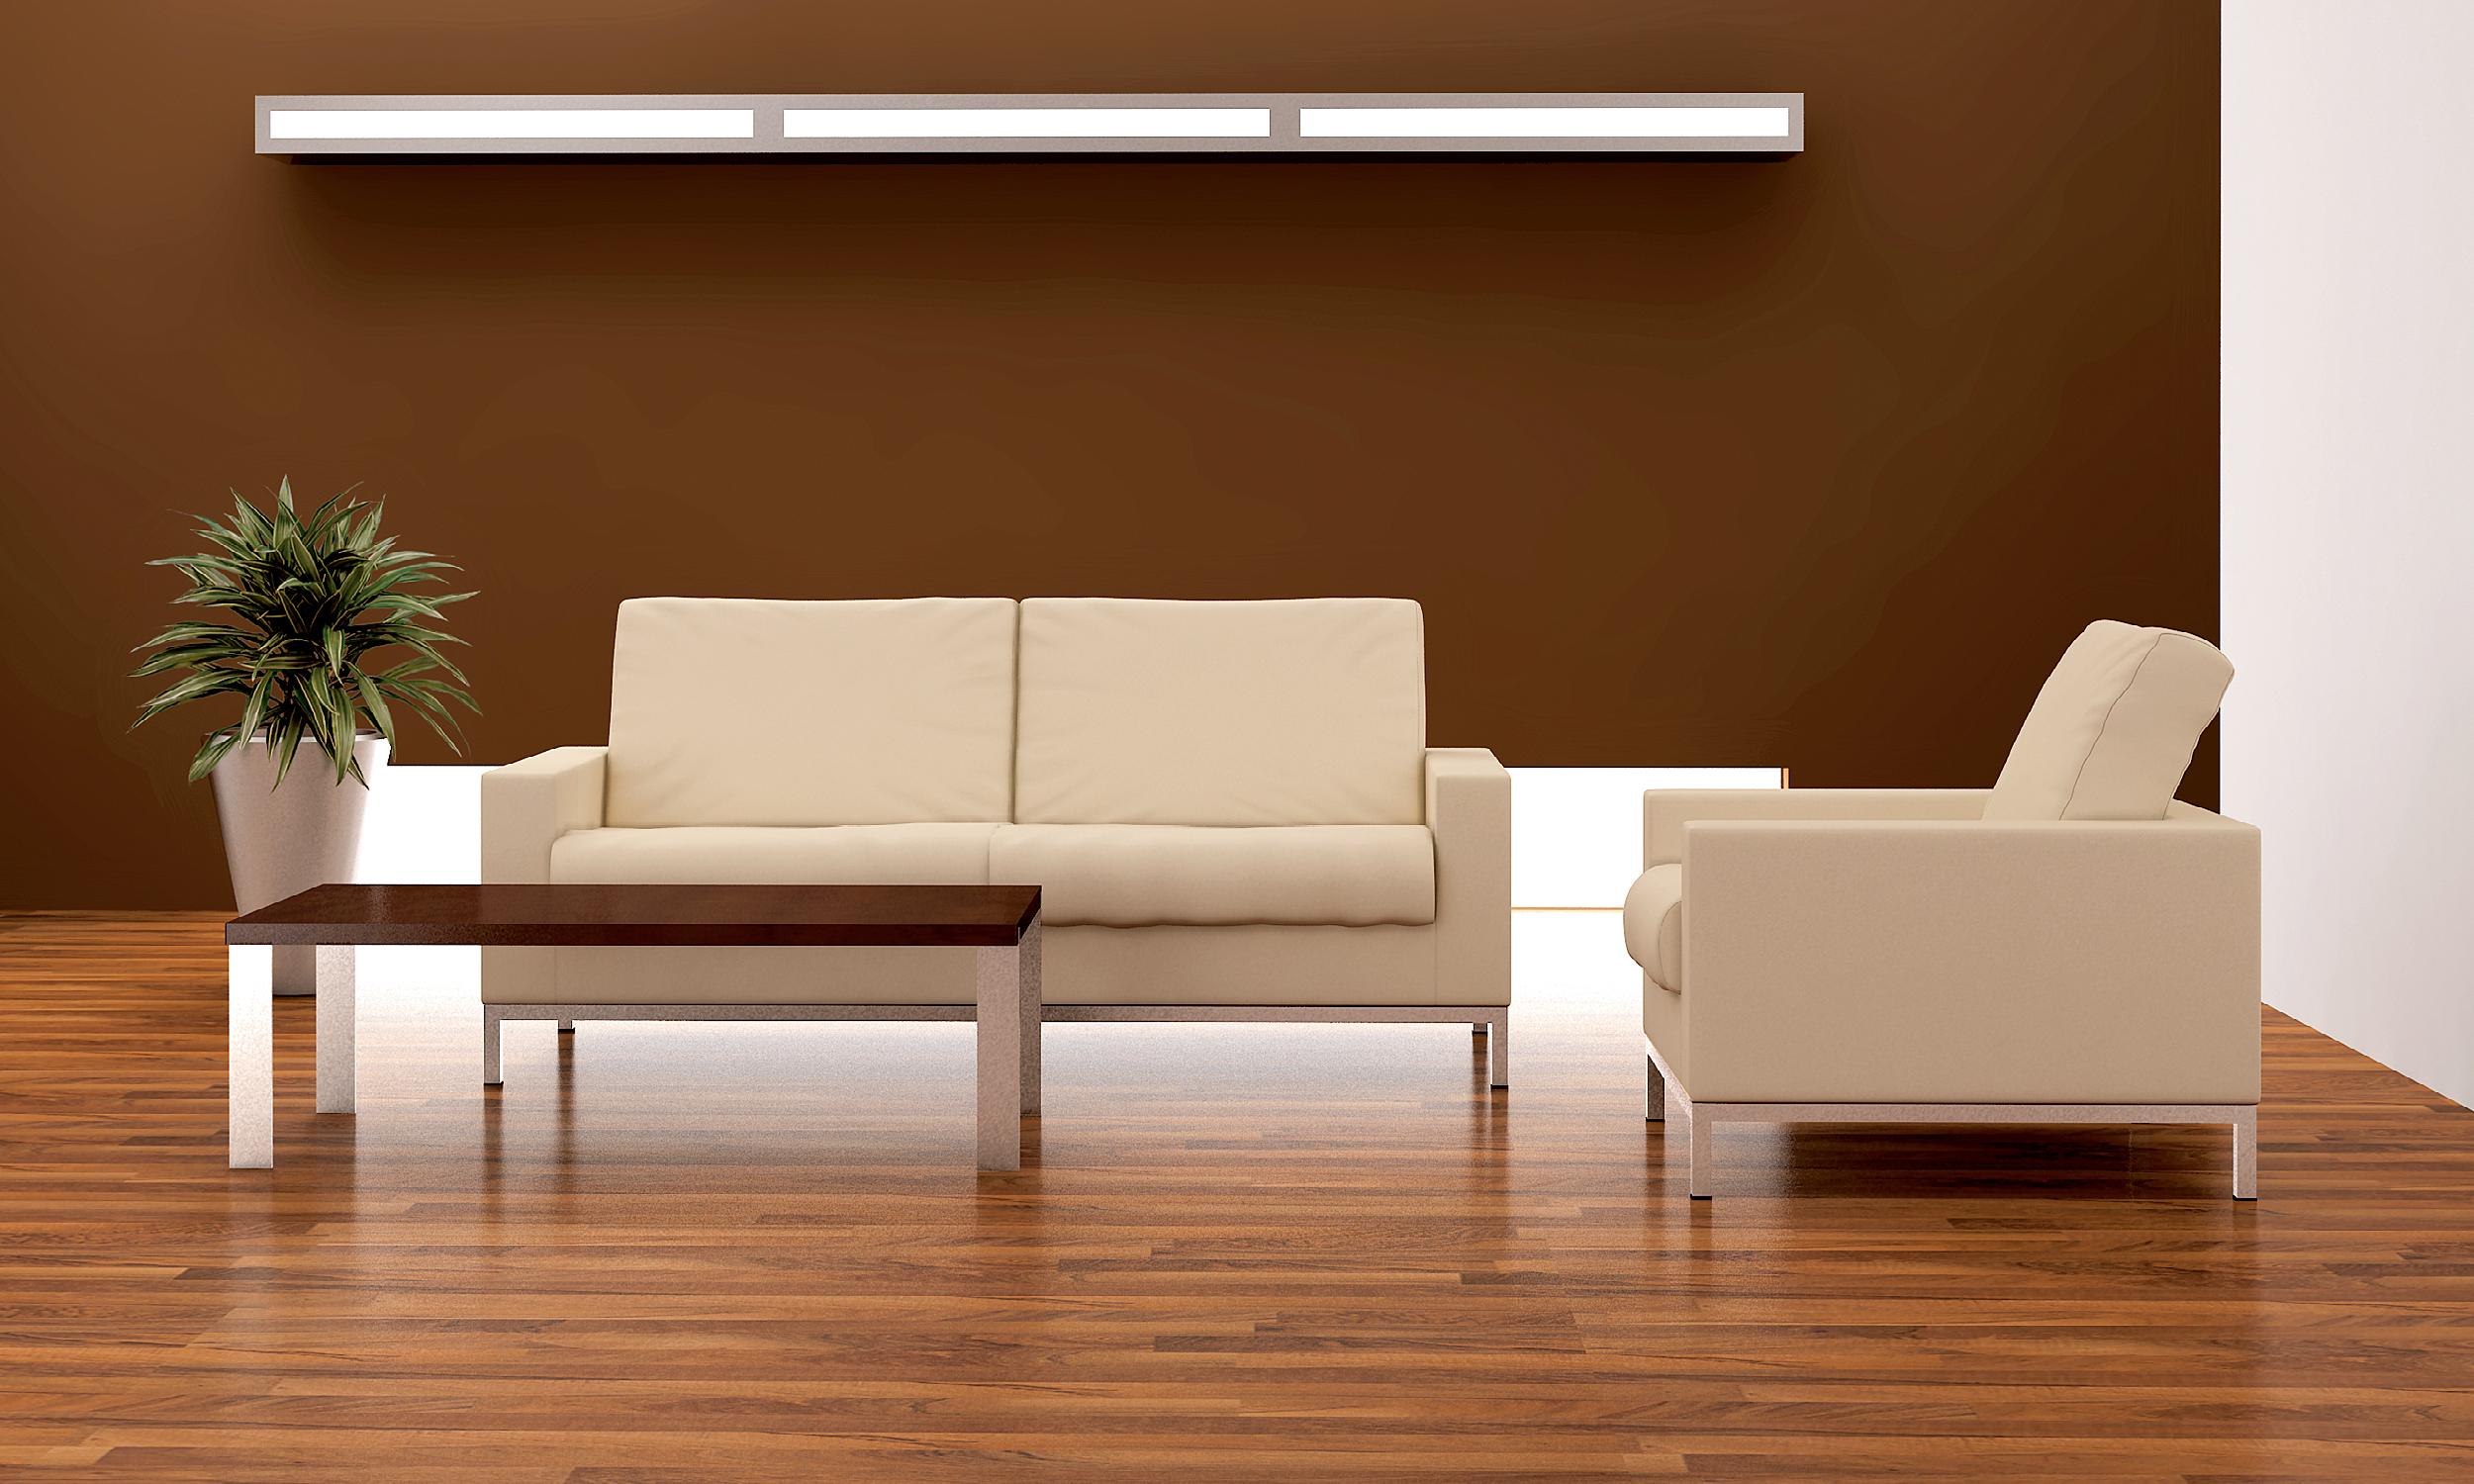 soft-seating_10-6_Concerto-1.jpg